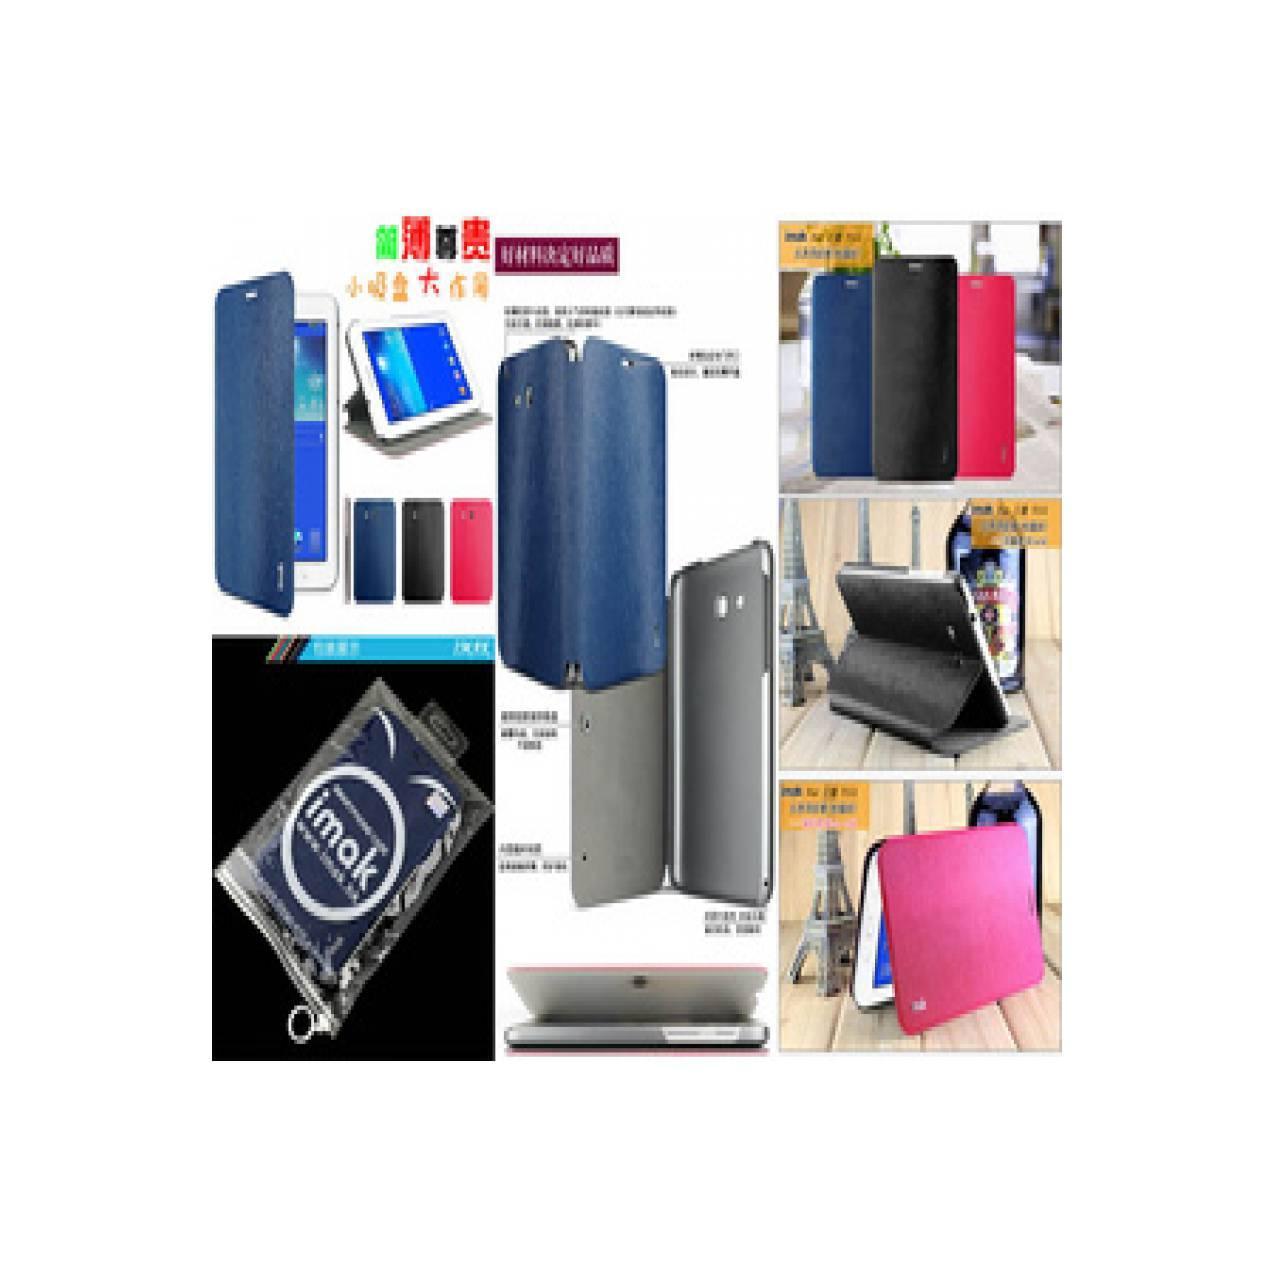 Jual Imak Texture Flip Cover Case Samsung Galaxy Tab 3 Lite 7.0 T1111